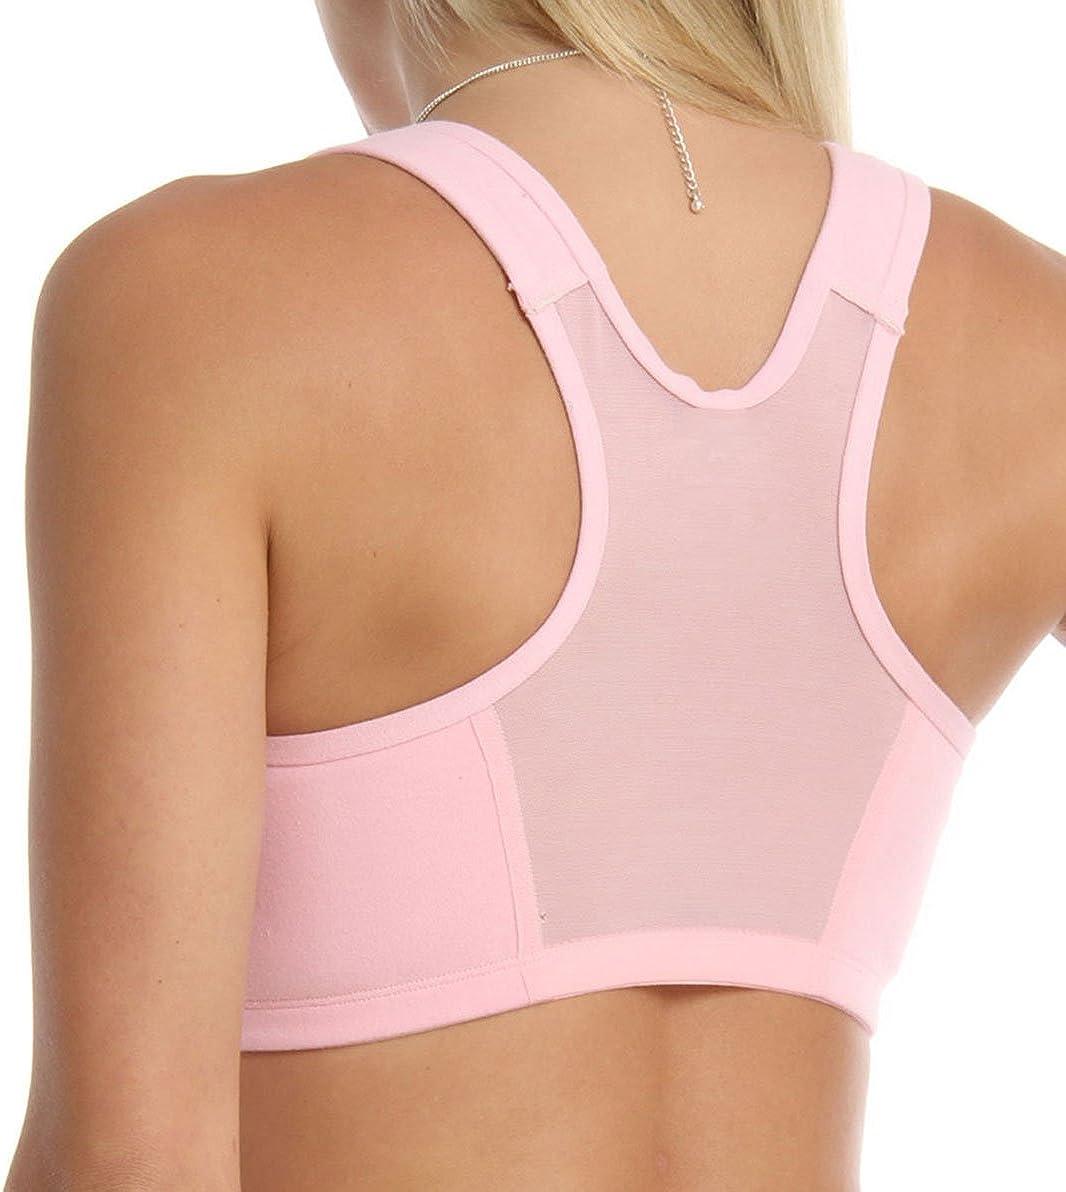 VALMONT 42D//E INC Womens Plus-Size Best Comfort Zip-Front Sports Bra Bra Pink